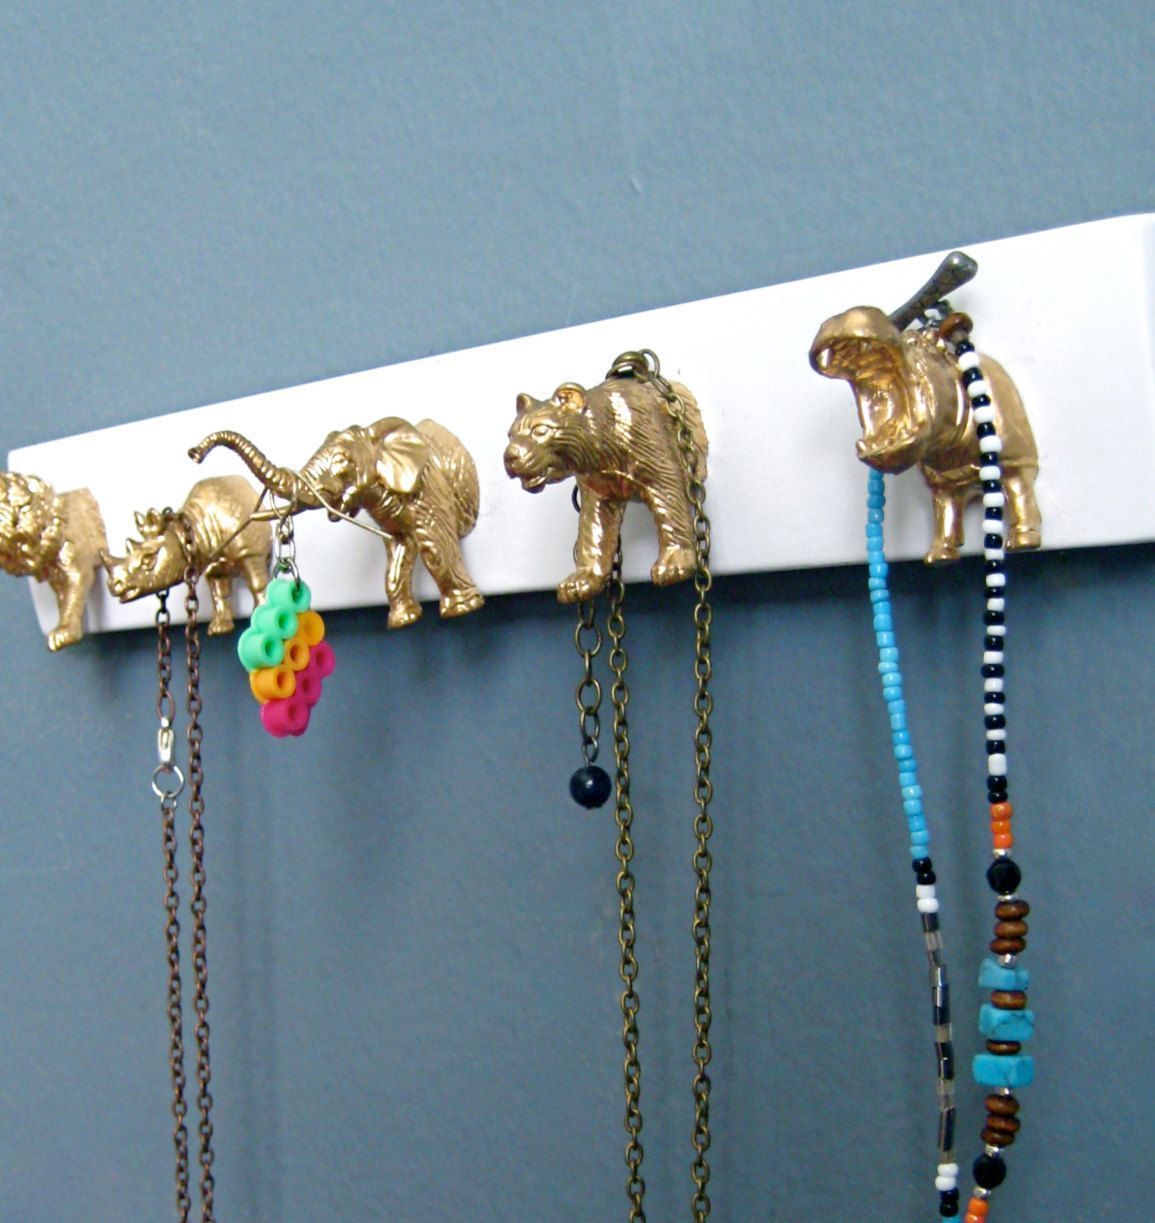 Gold Animal Key Hooks, Gold Animal Jewelry Display, Key Rack, White and Gold